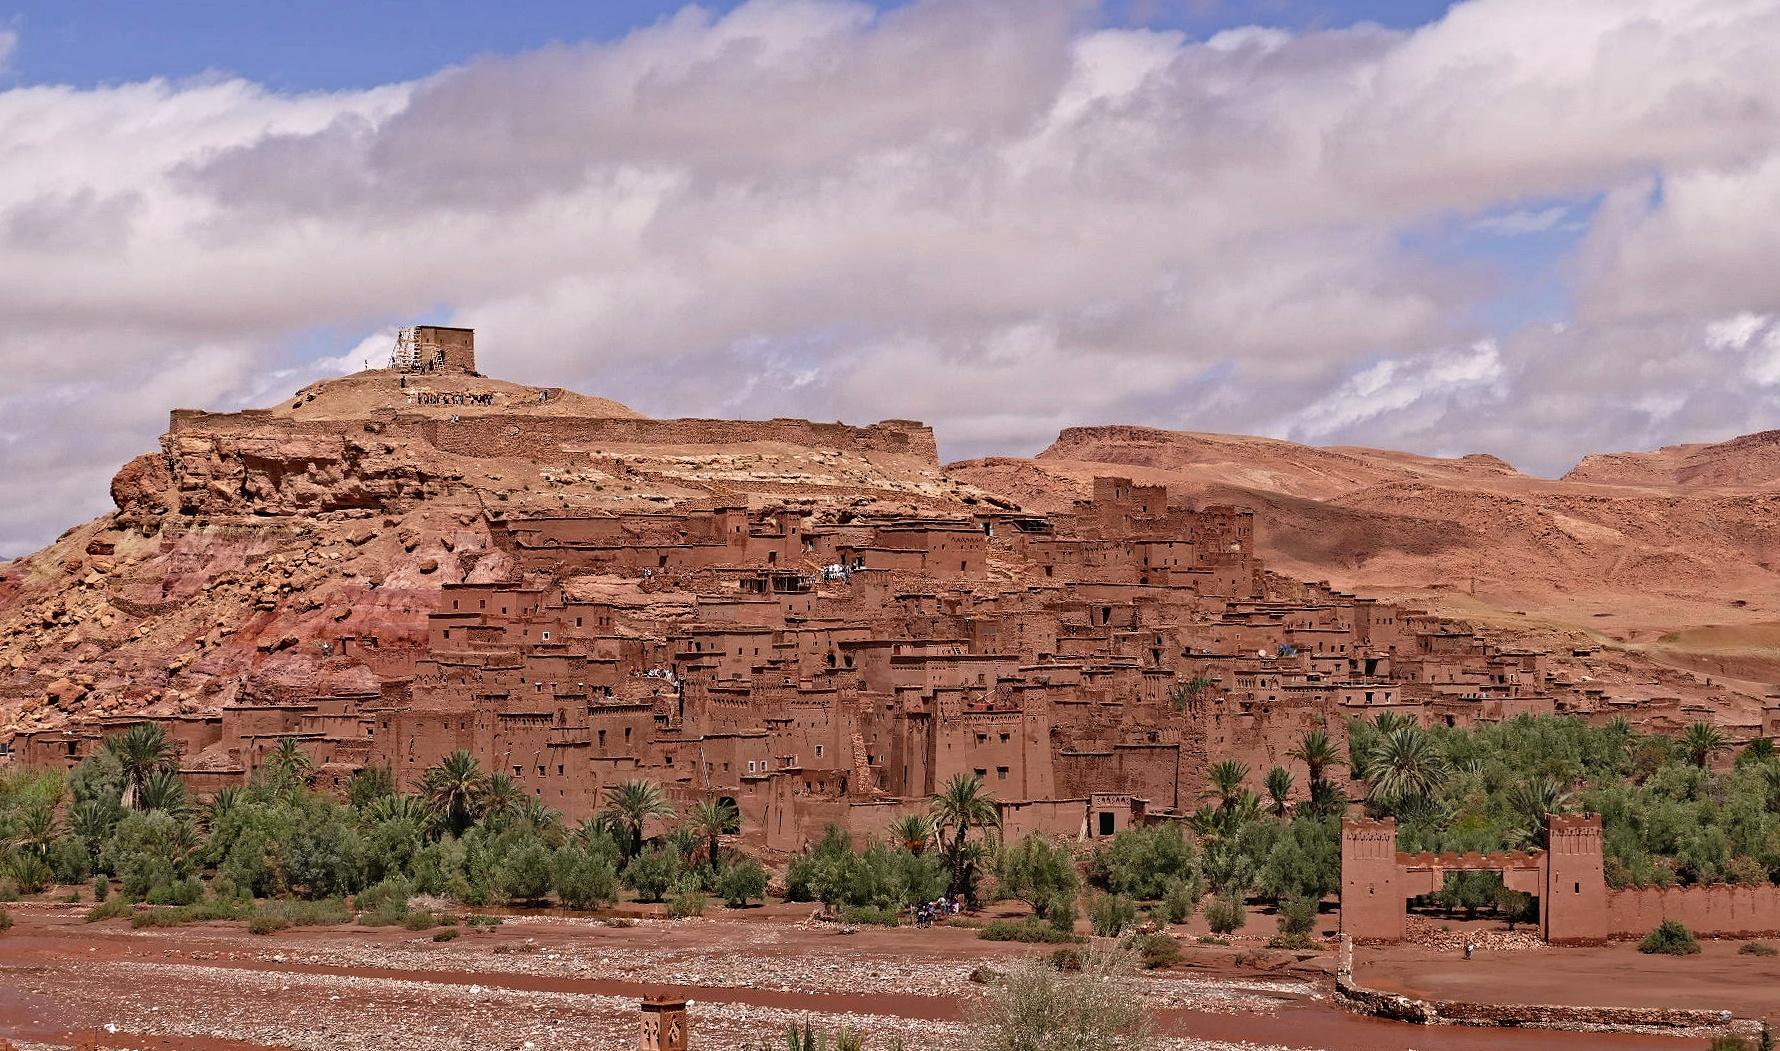 Altes Wehrdorf in Marokko